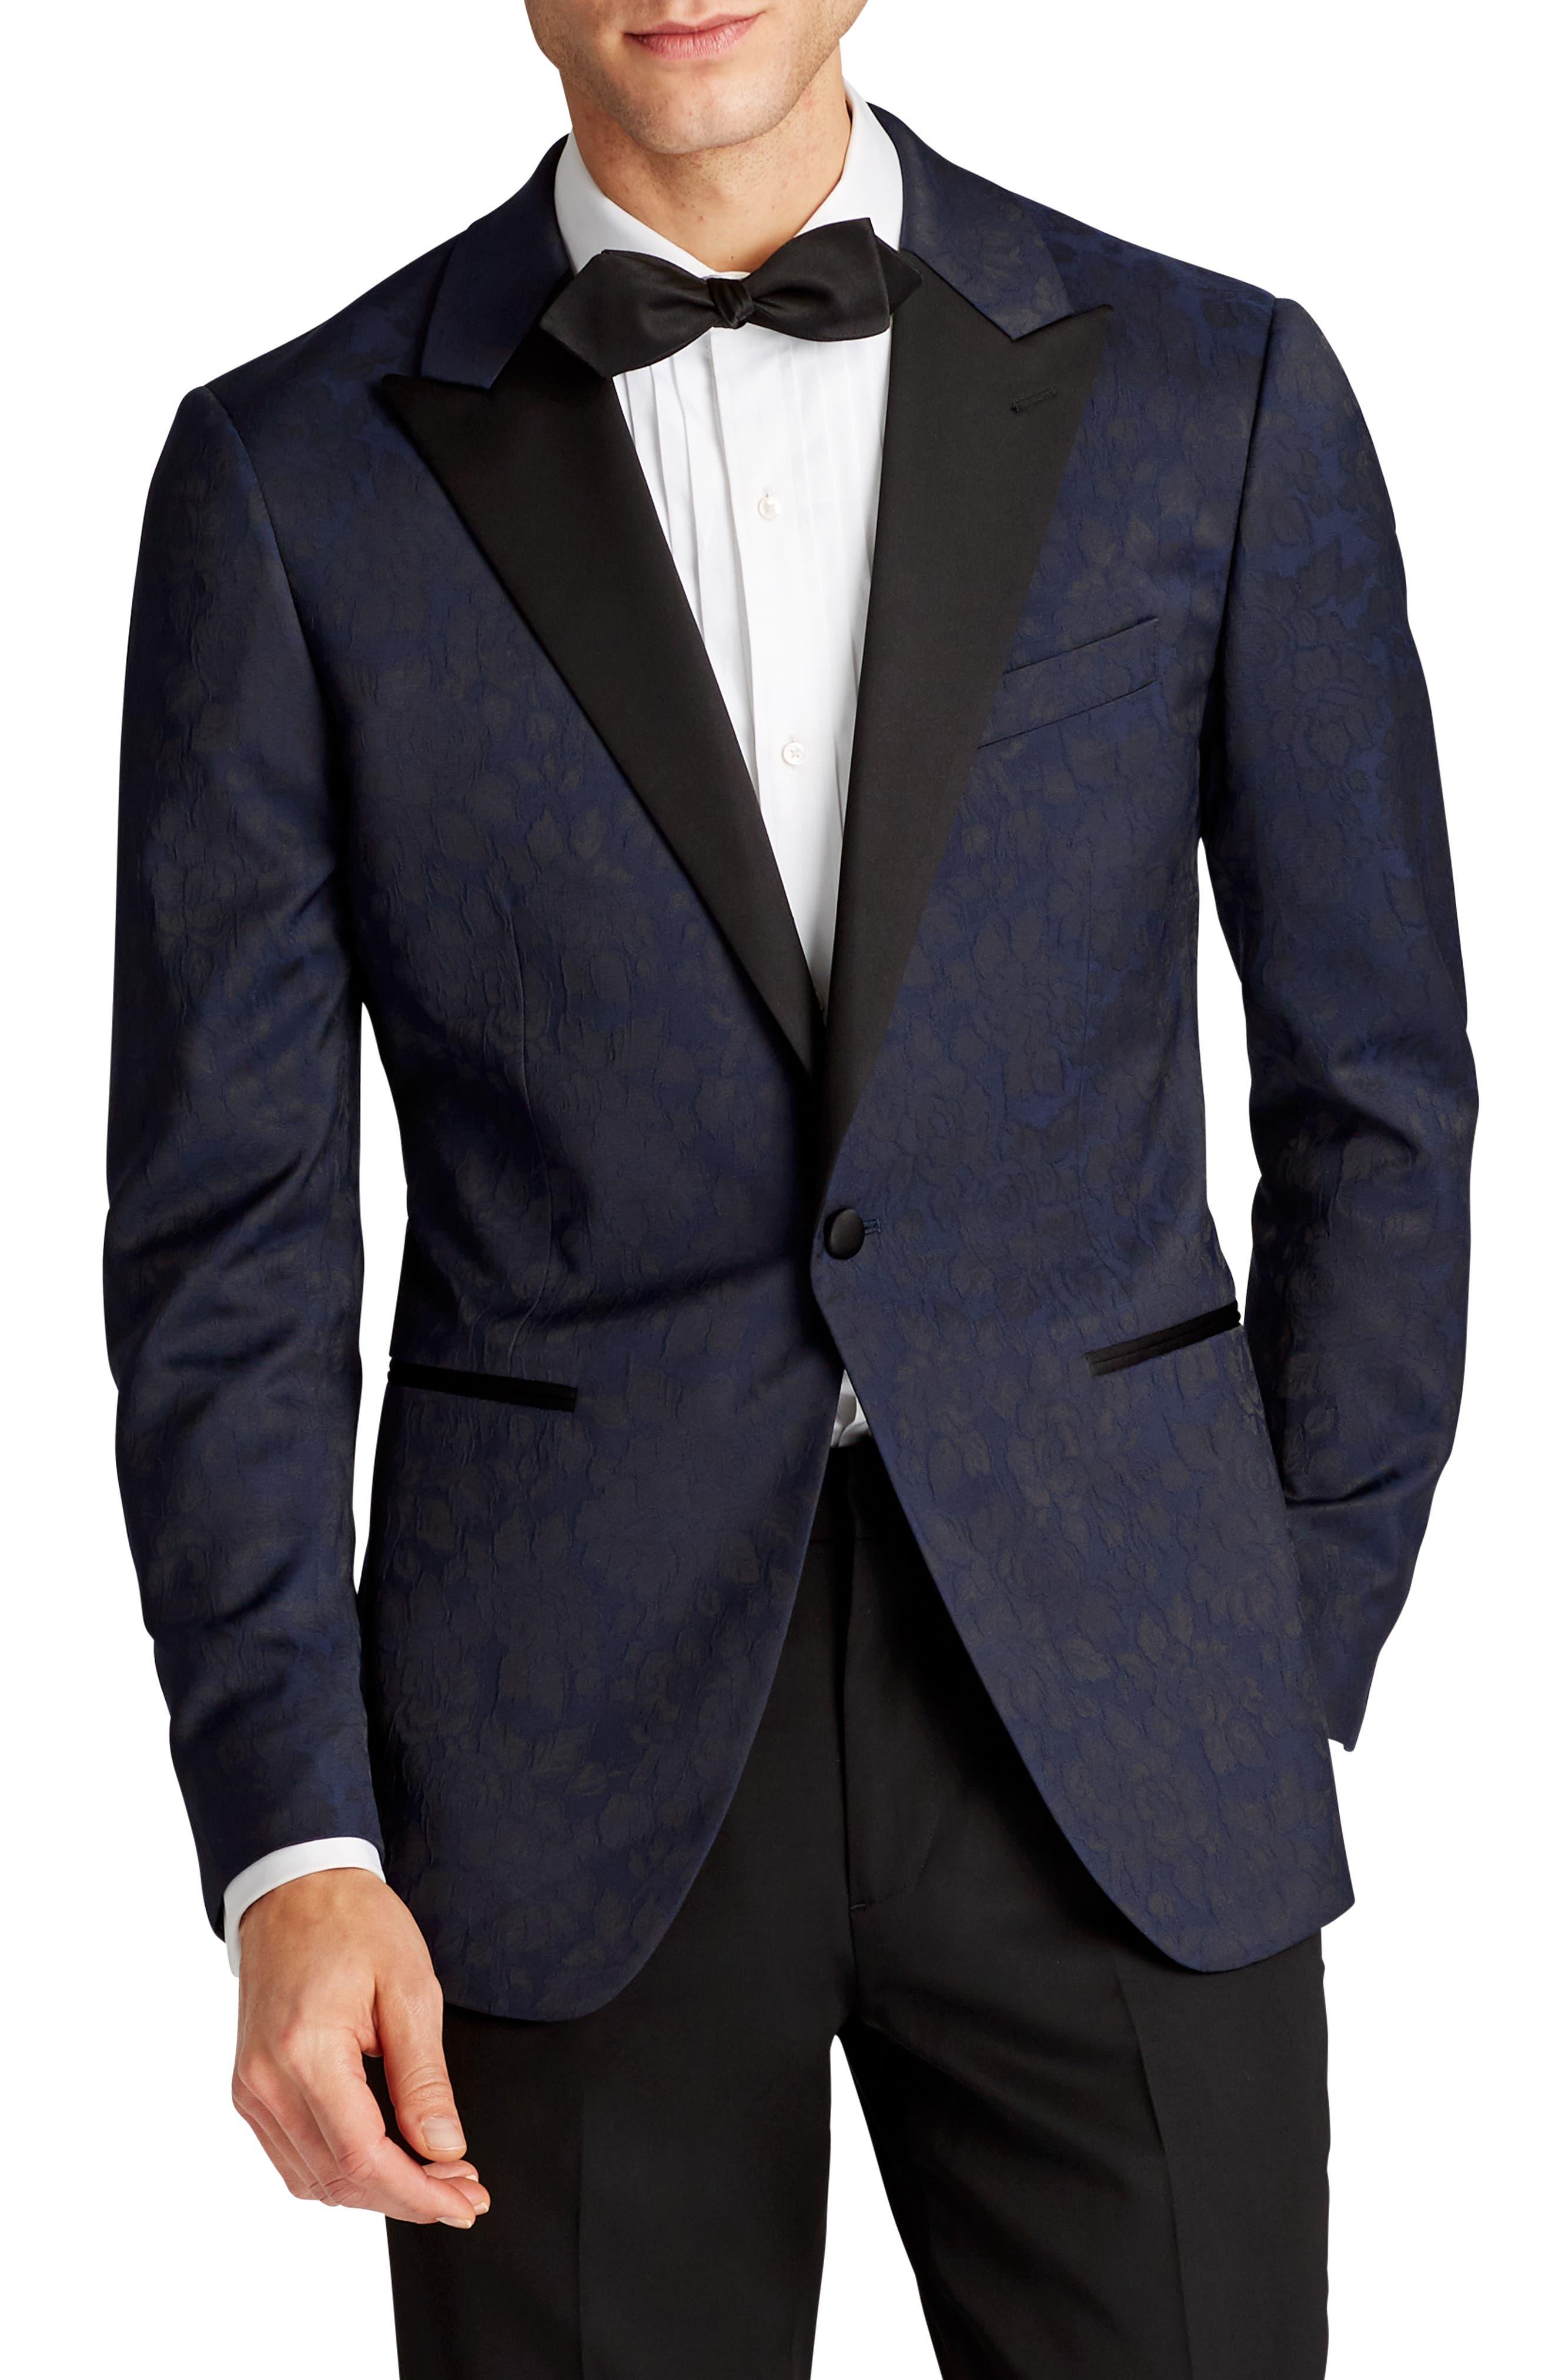 Capstone Slim Fit Stretch Dinner Jacket,                         Main,                         color, 400